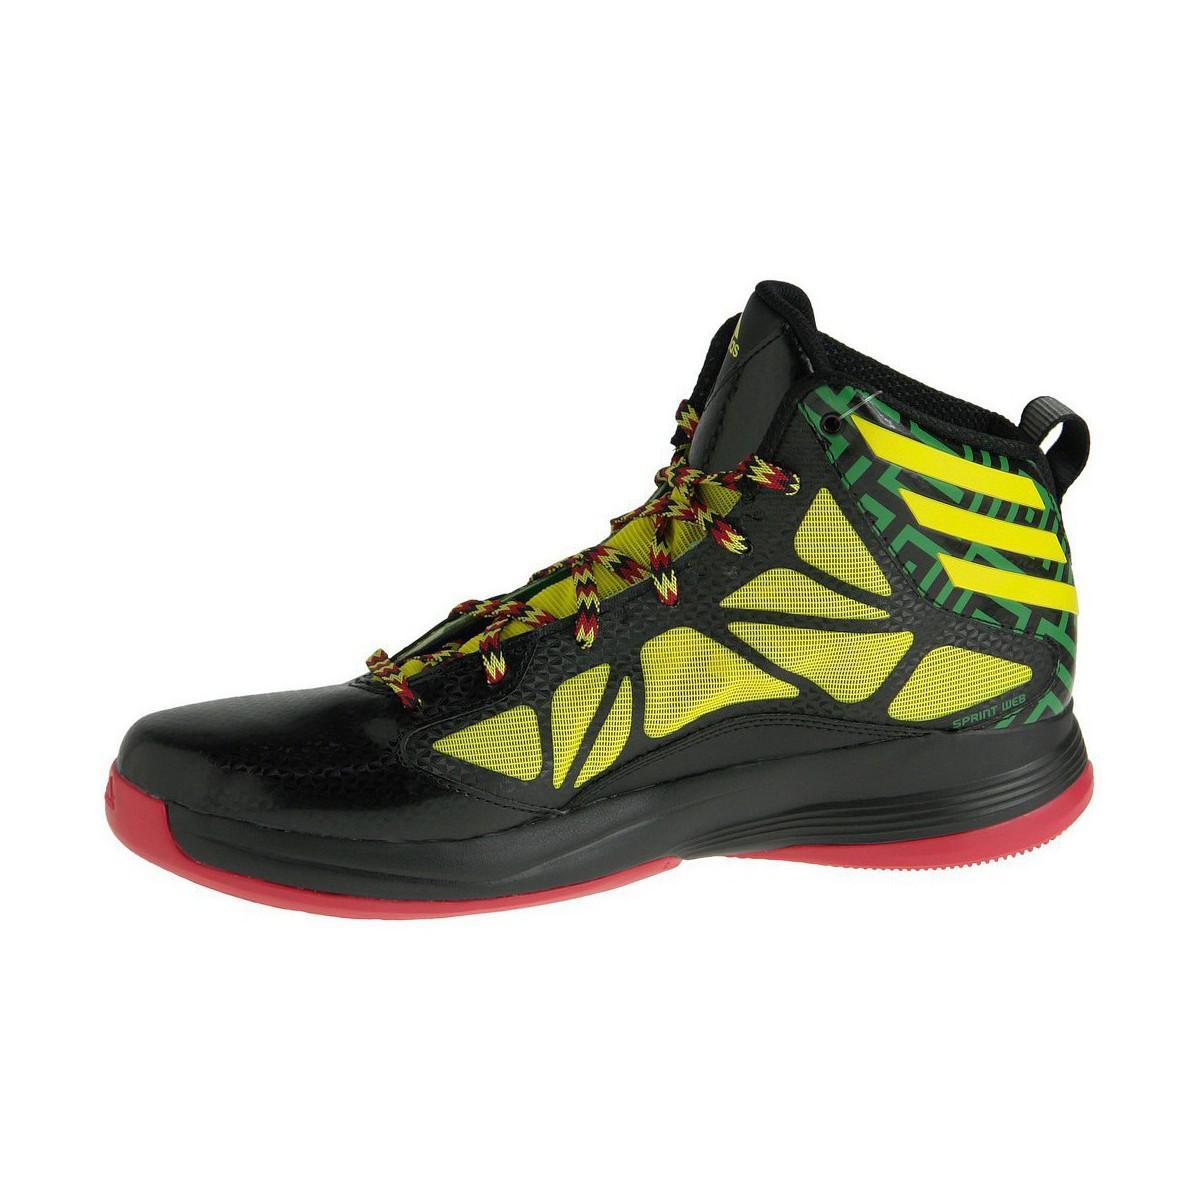 Adidas Originals Crazy Fast hombre 's Basketball formadores (zapatos) en